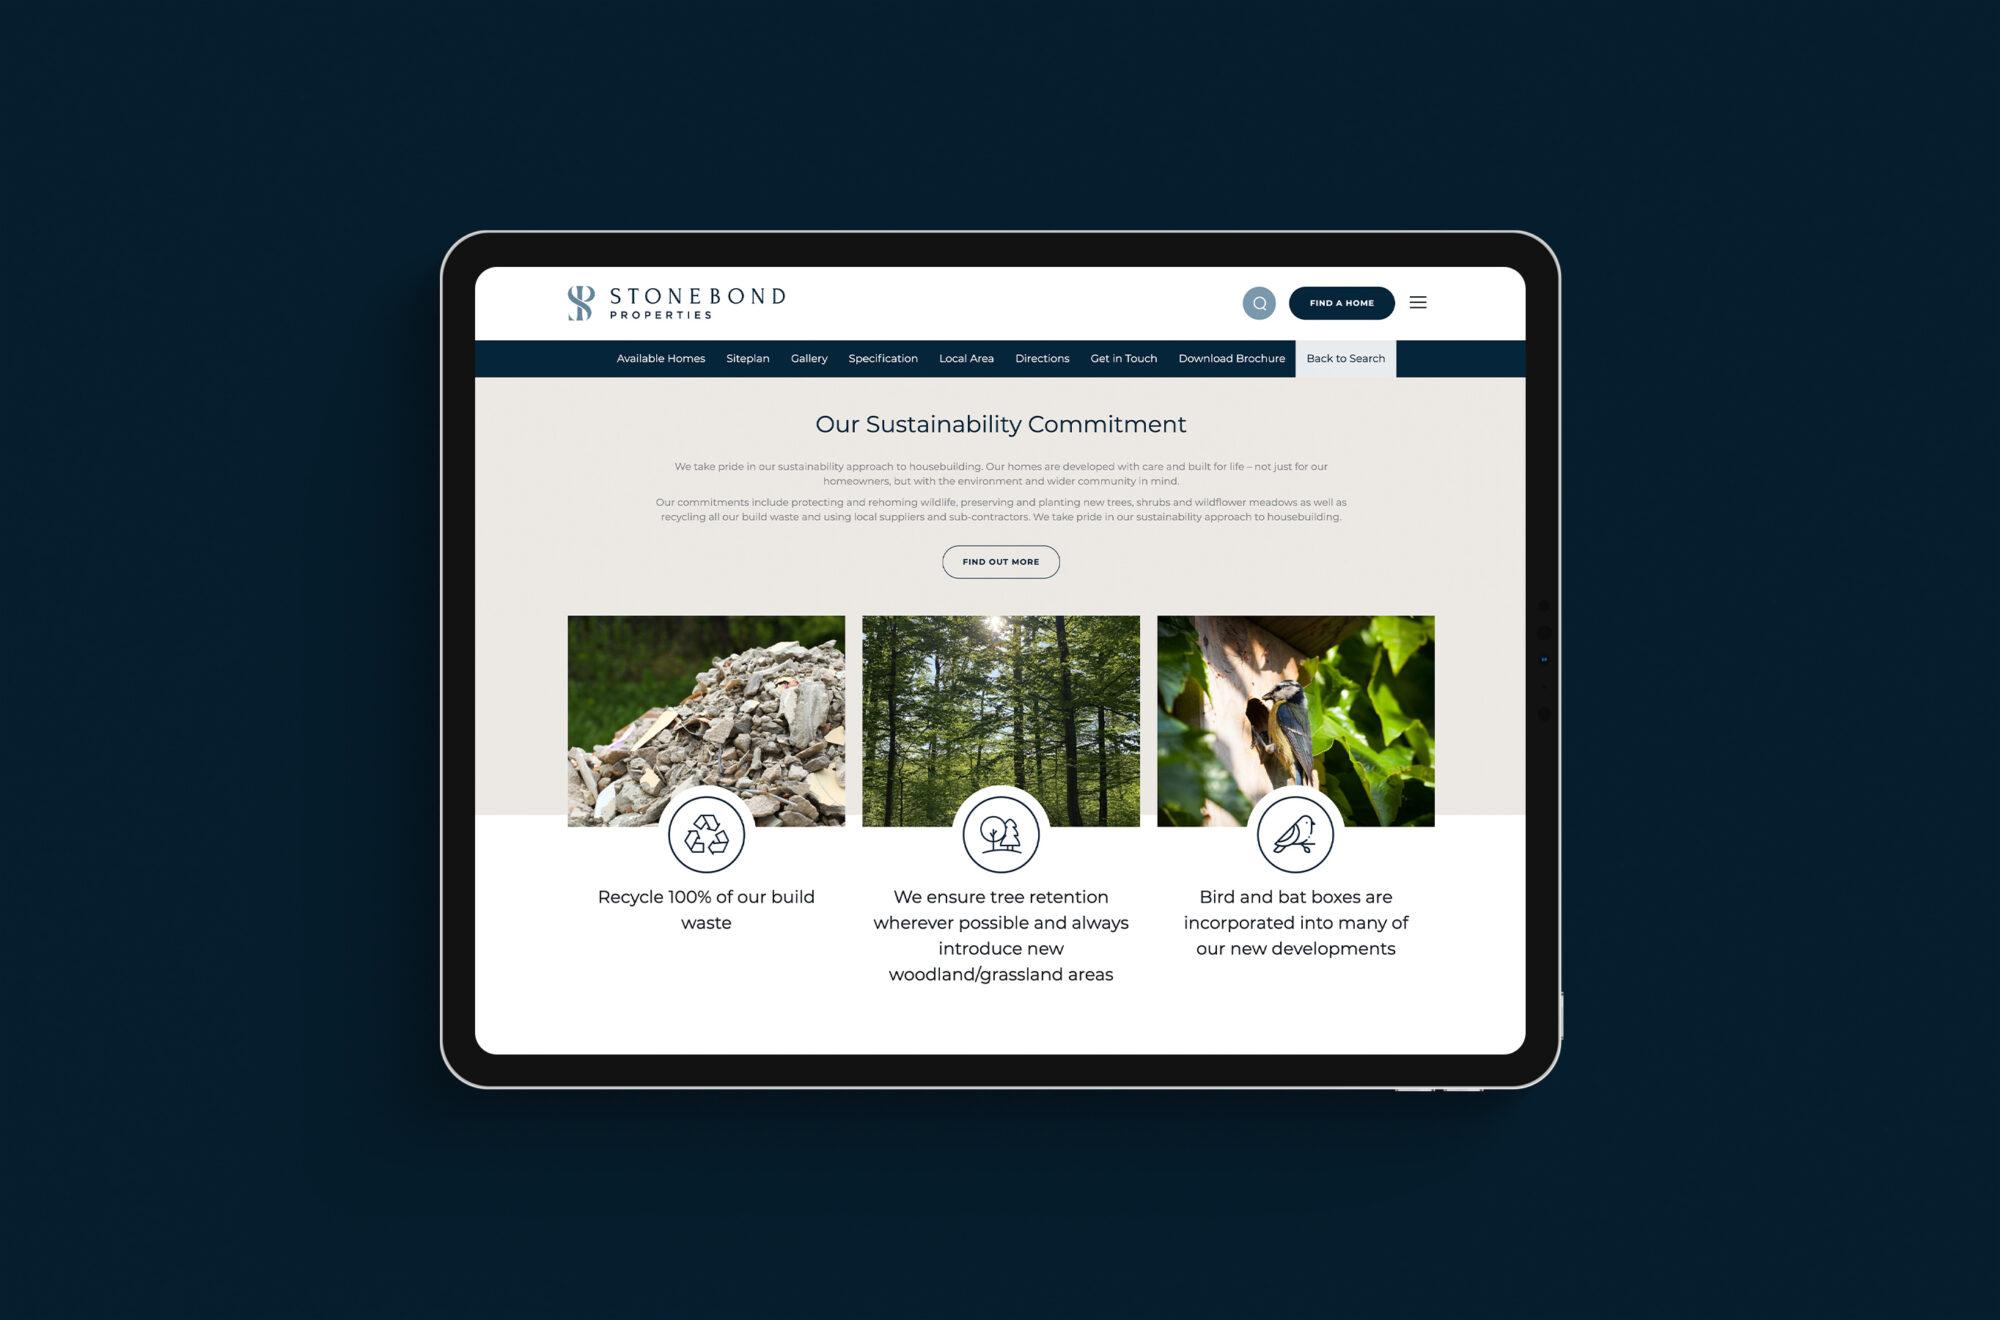 Stonebond Properties website mockup